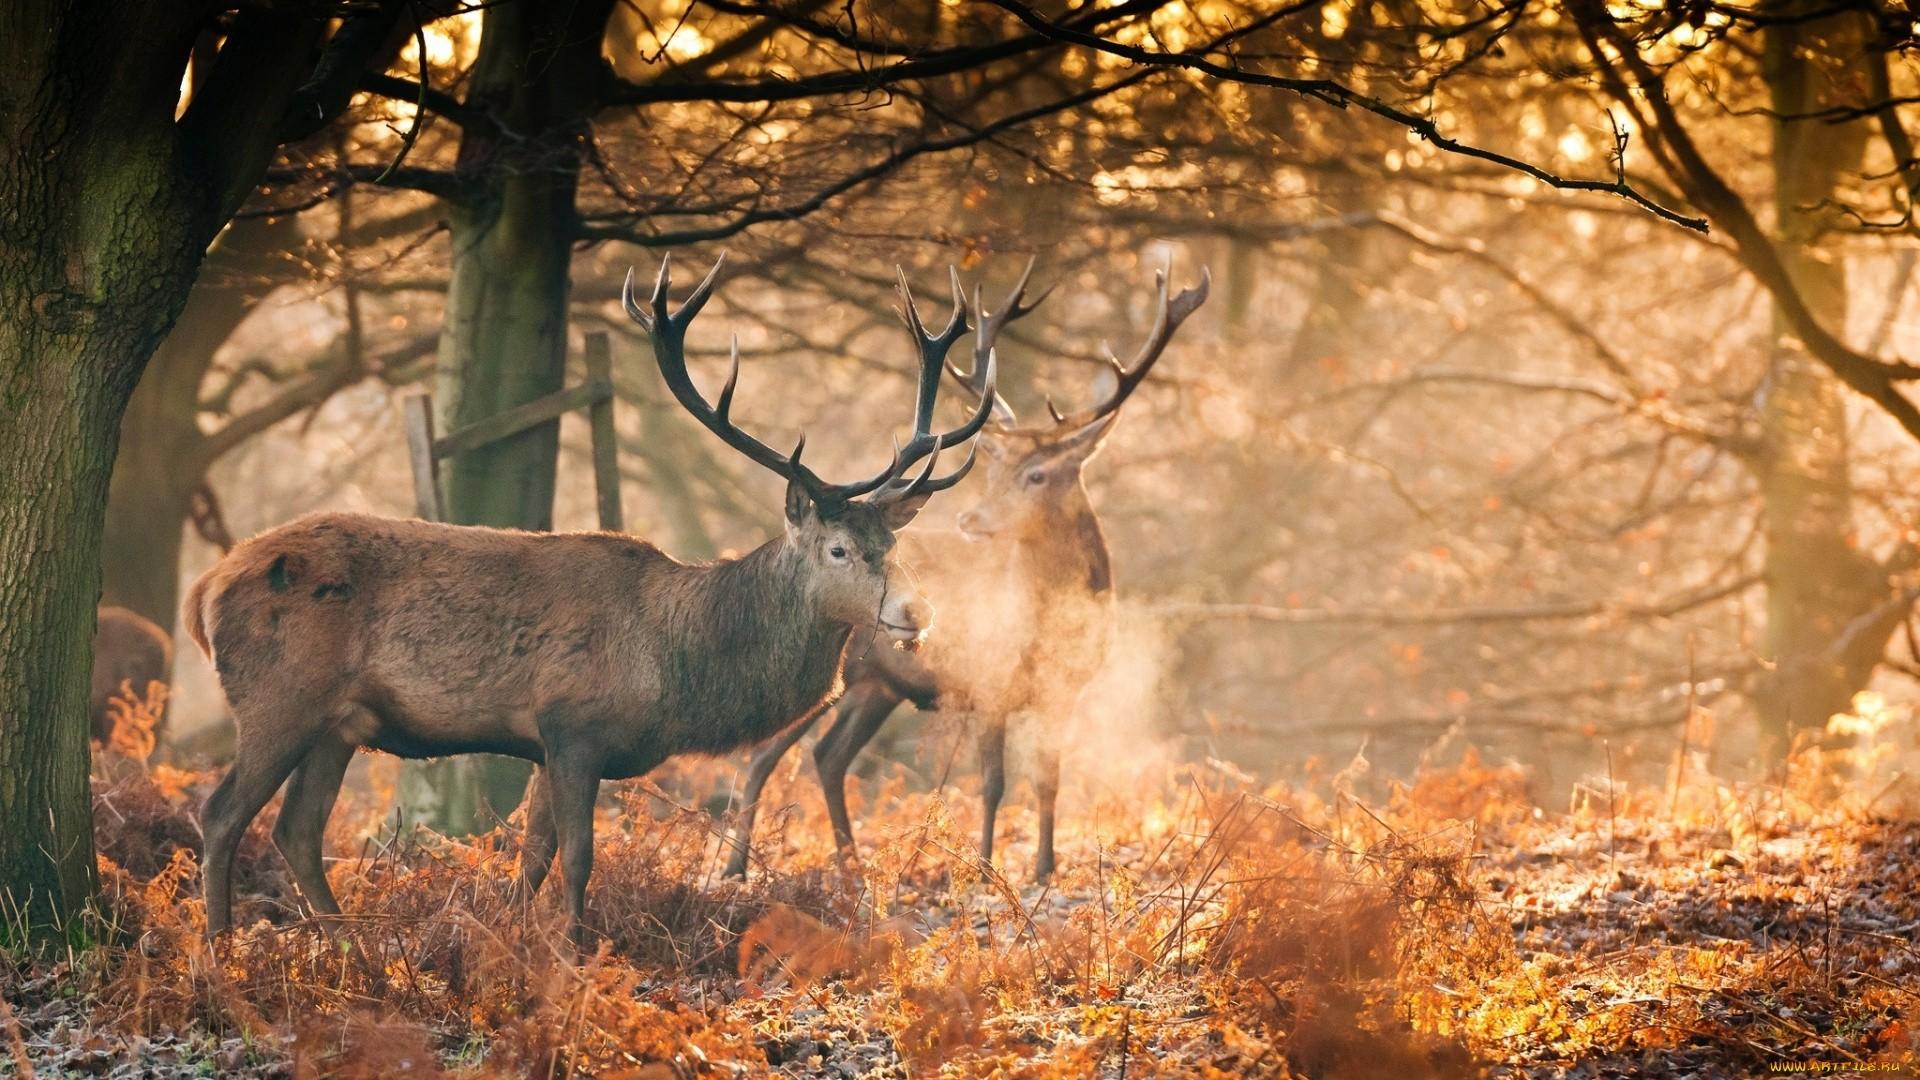 Deer Wallpaper for pc